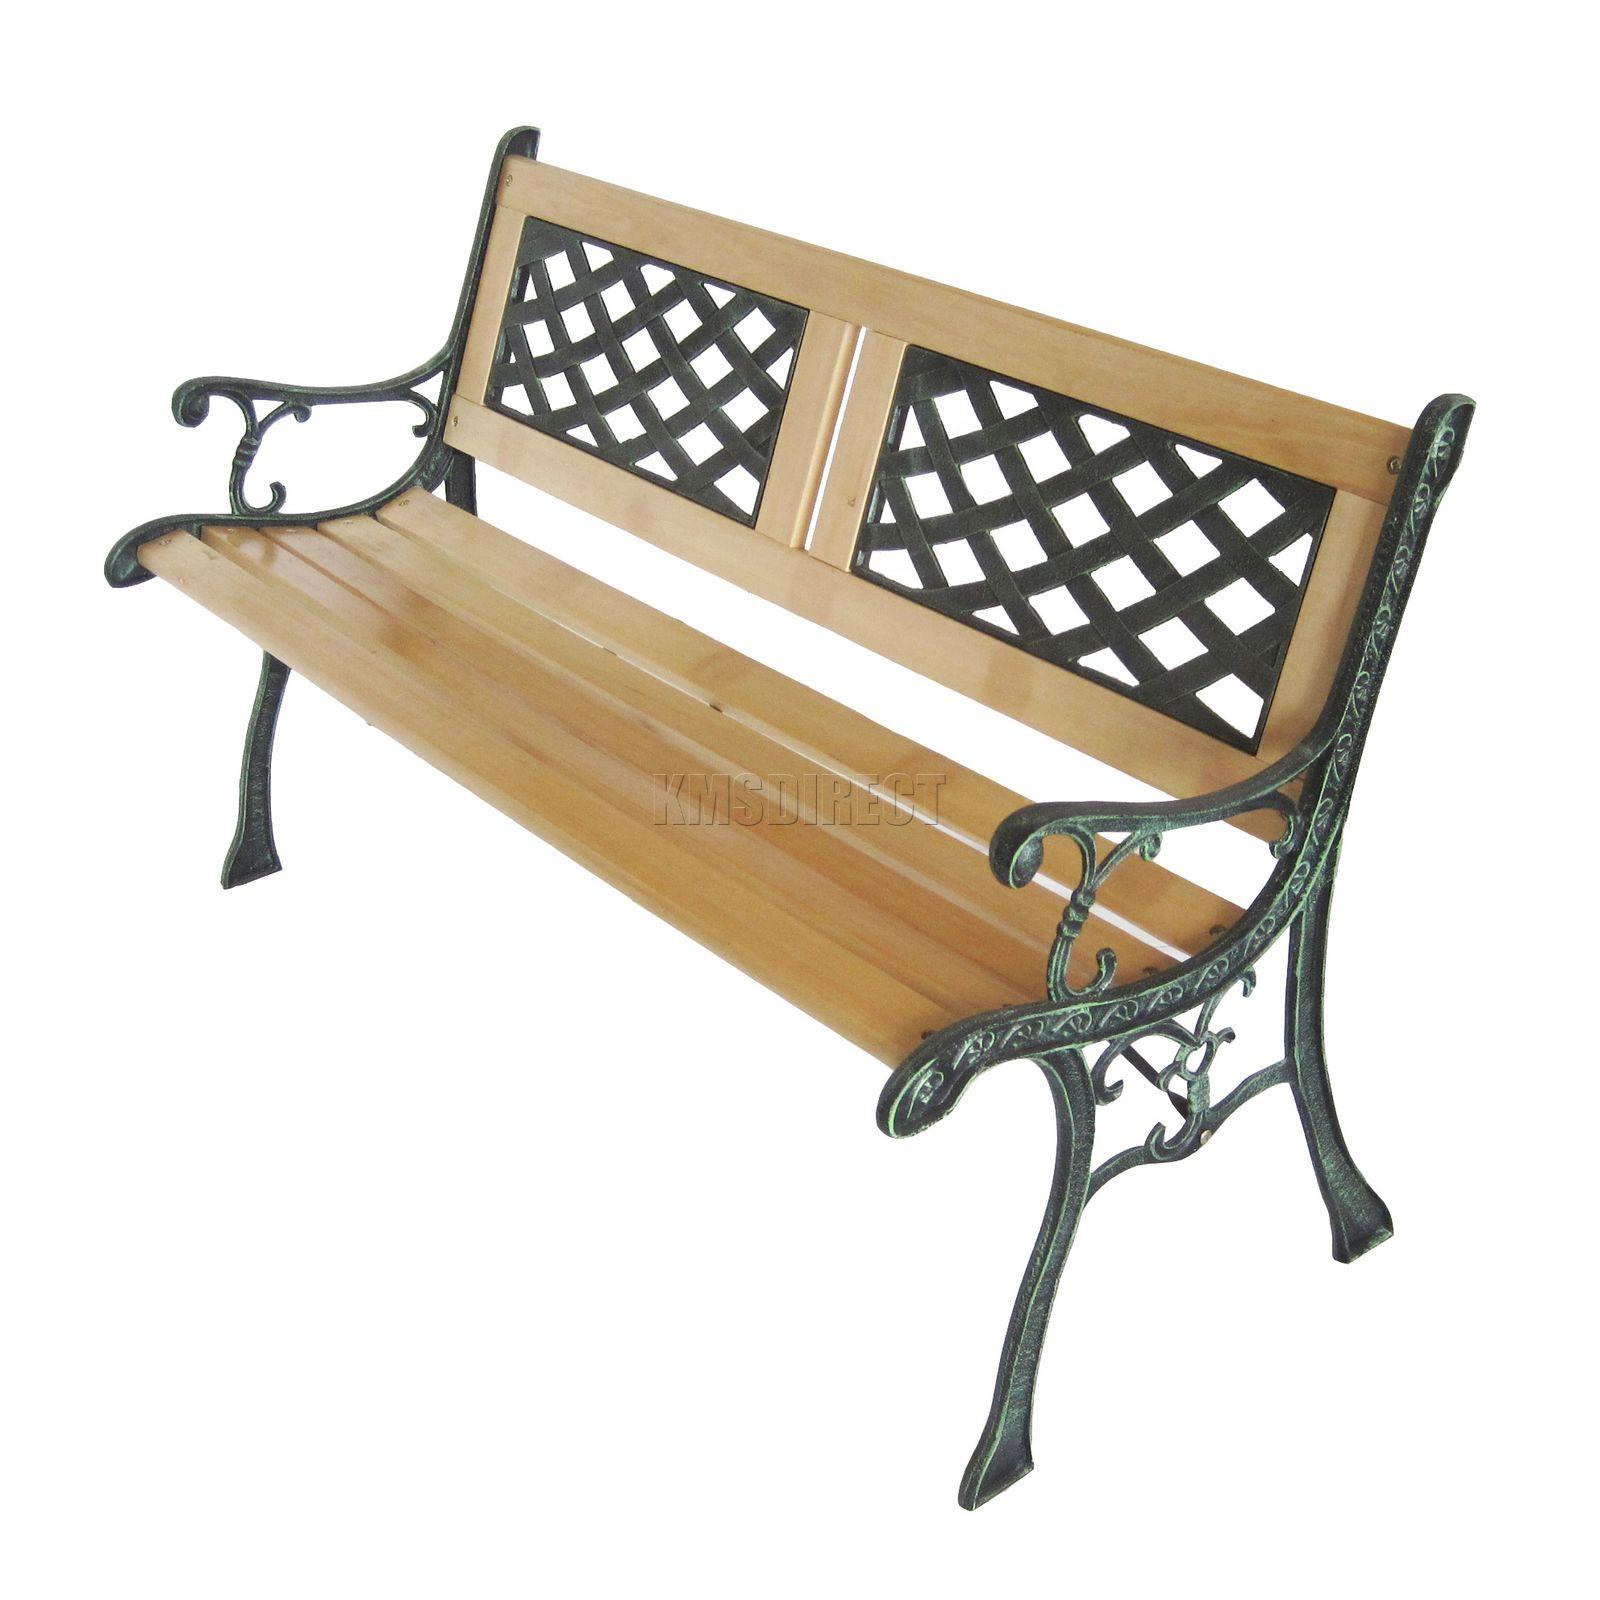 3 Seater Outdoor Wooden Garden Bench Lattice Slat With